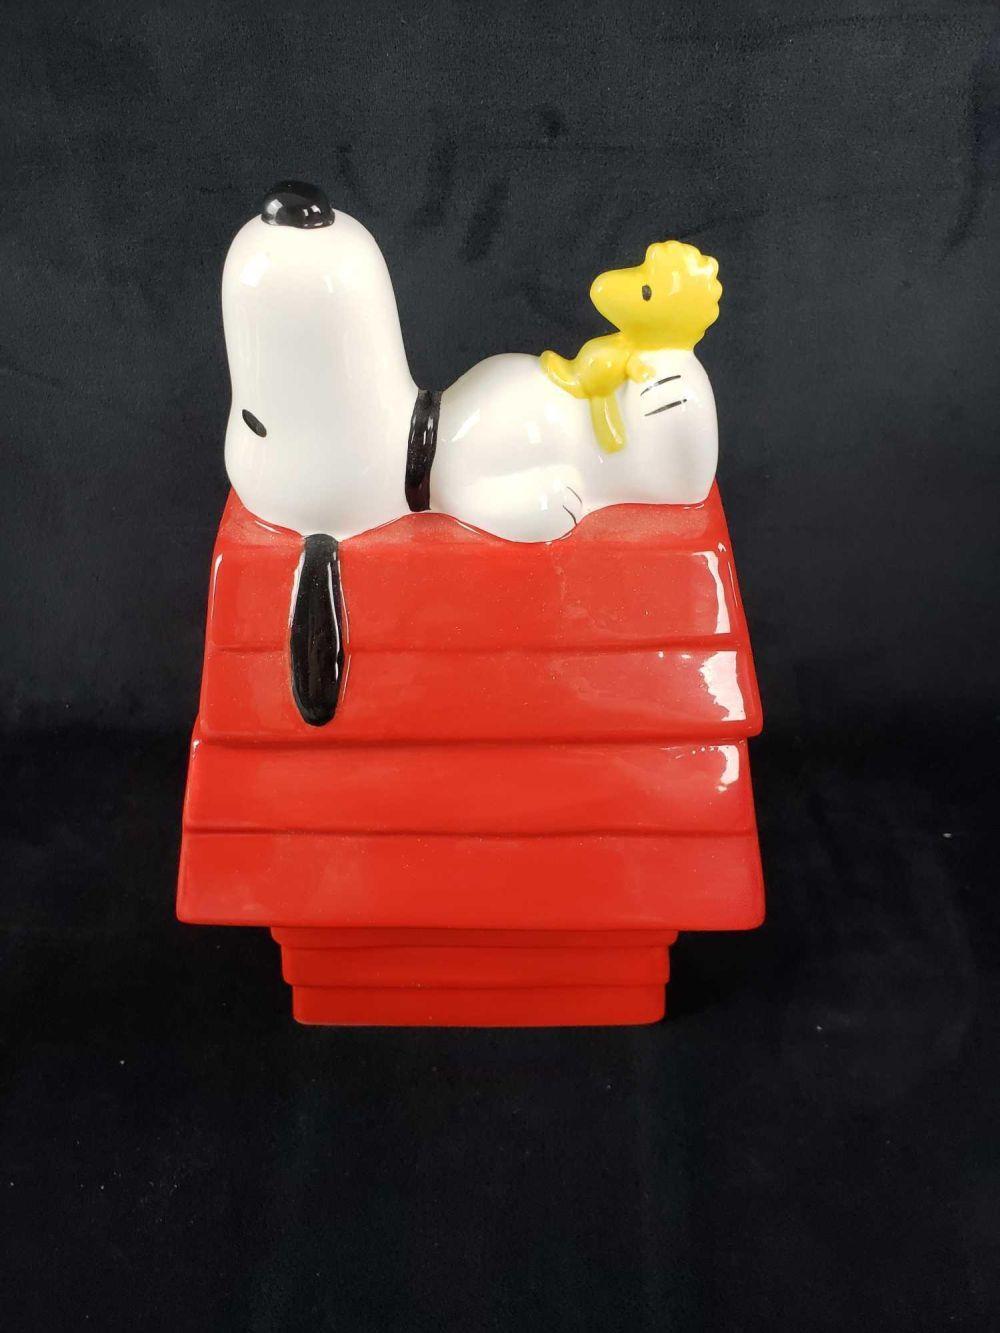 Lot 425: Peanuts Snoopy and Woodstock Break Time Ceramic Cookie Jar